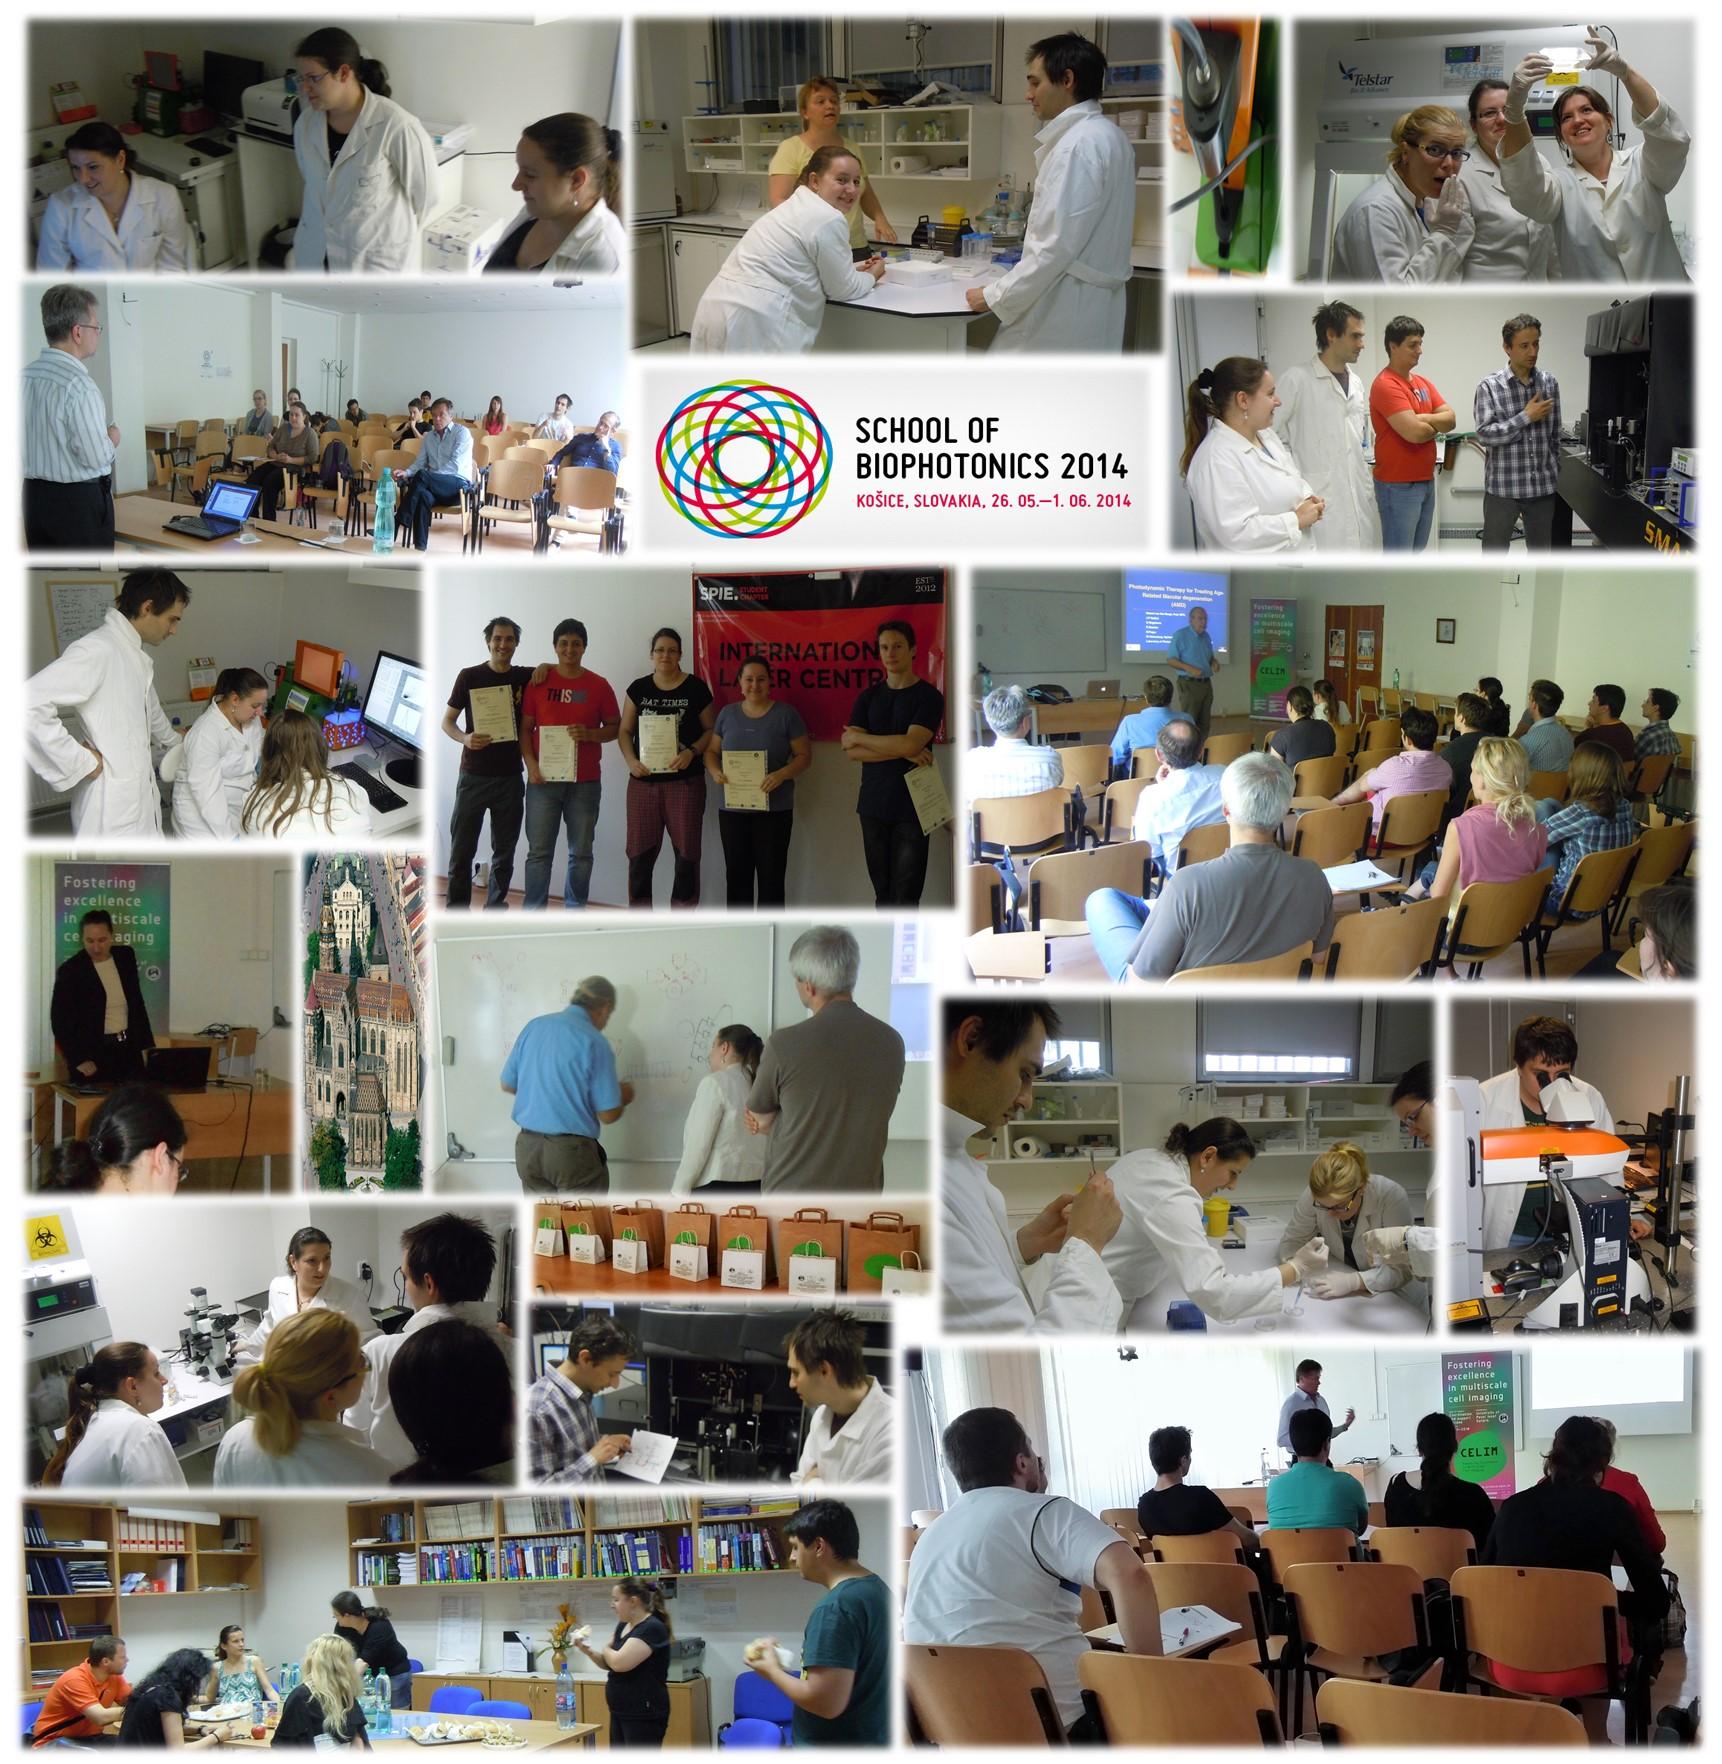 Conference SCHOOL OF BIOPHOTONICS 2014